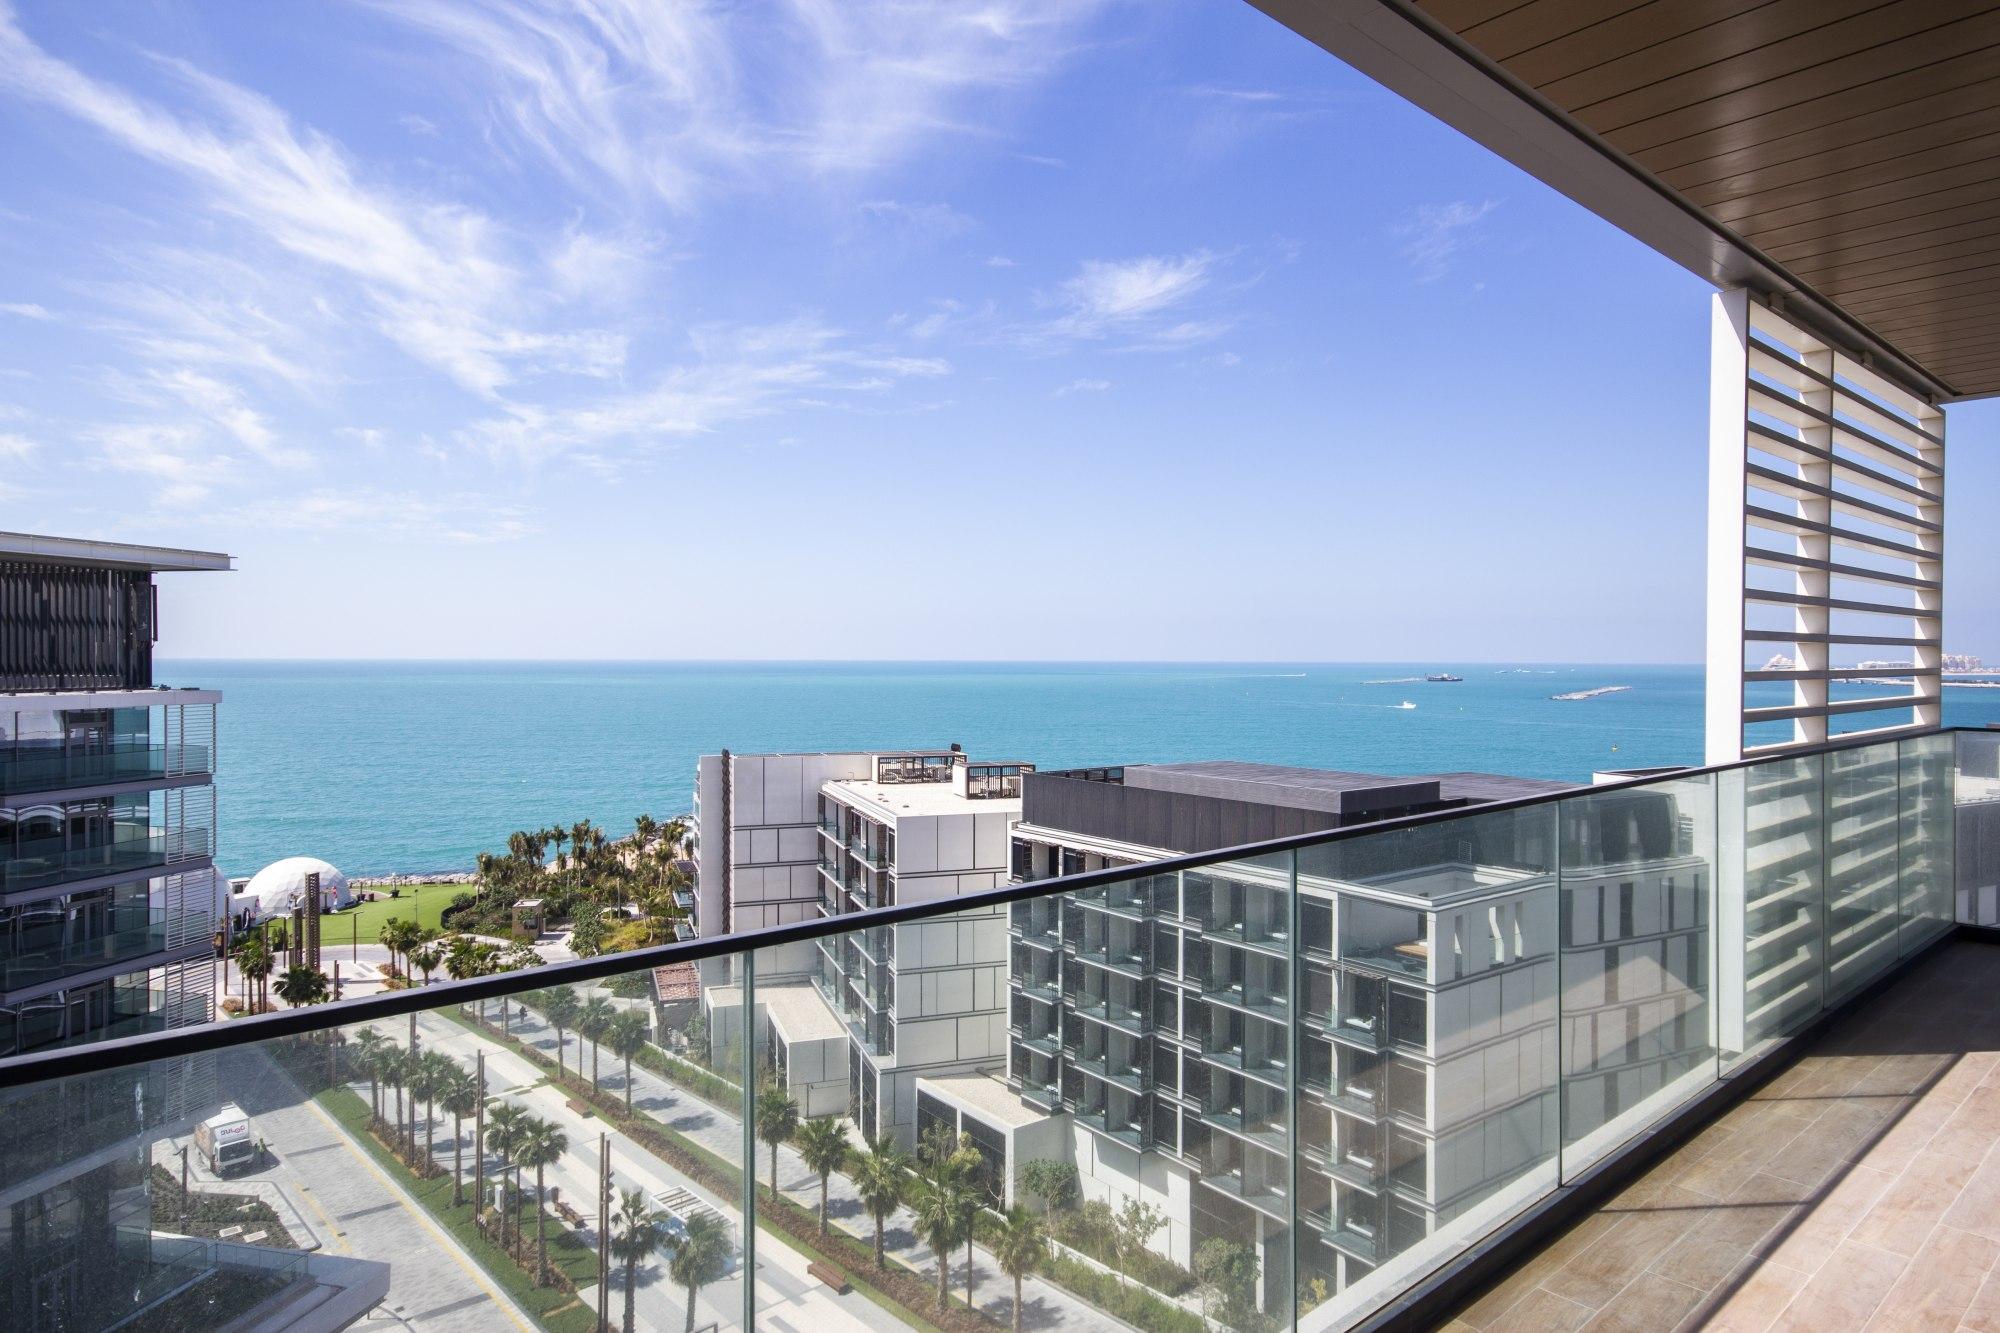 New 04Bed Apt | Sea View | Urban Island Living